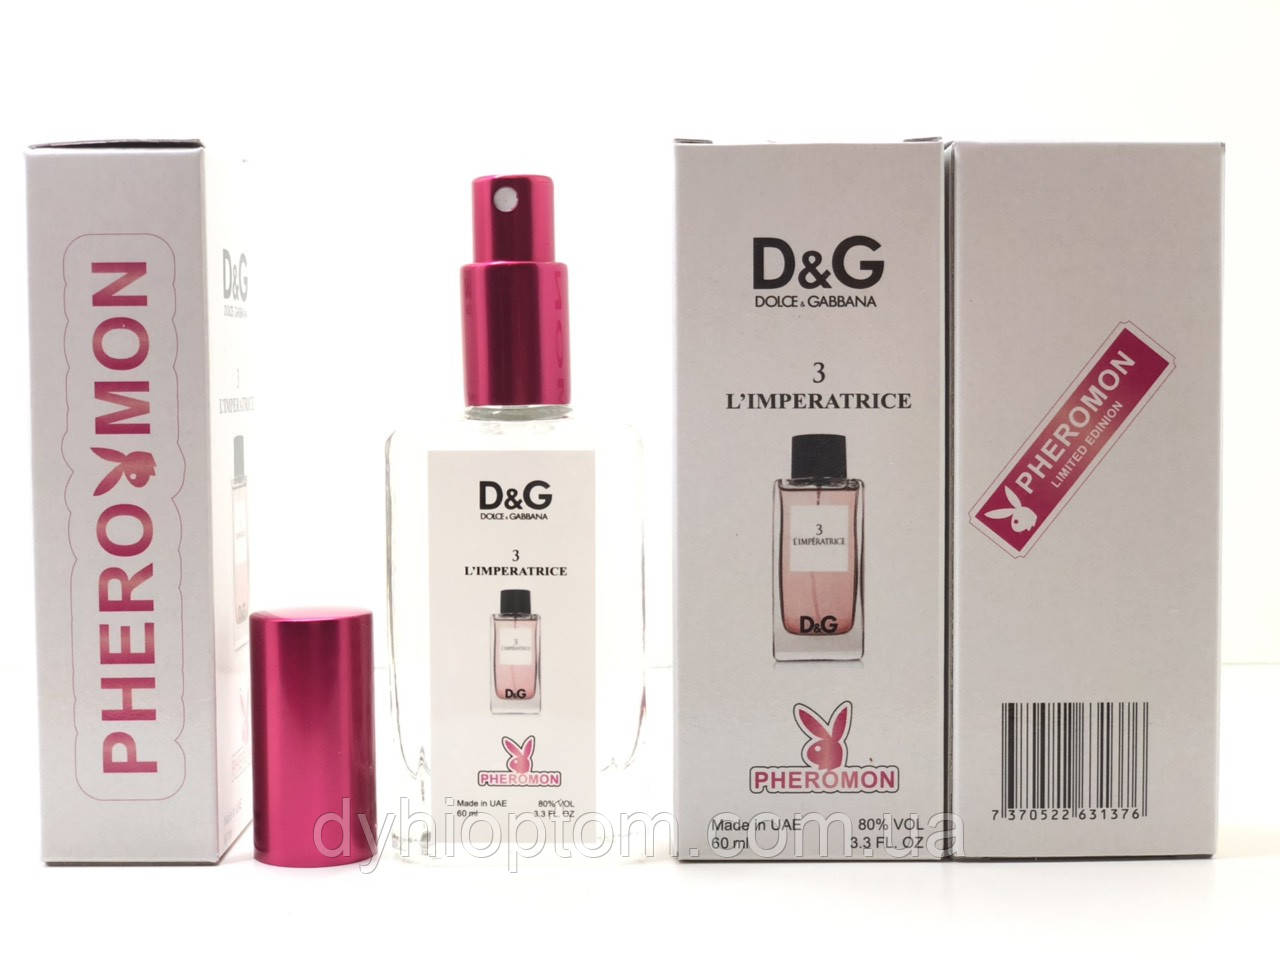 Женский парфюм Dolce&Gabbana L`Imperatrice 3, 60 ml